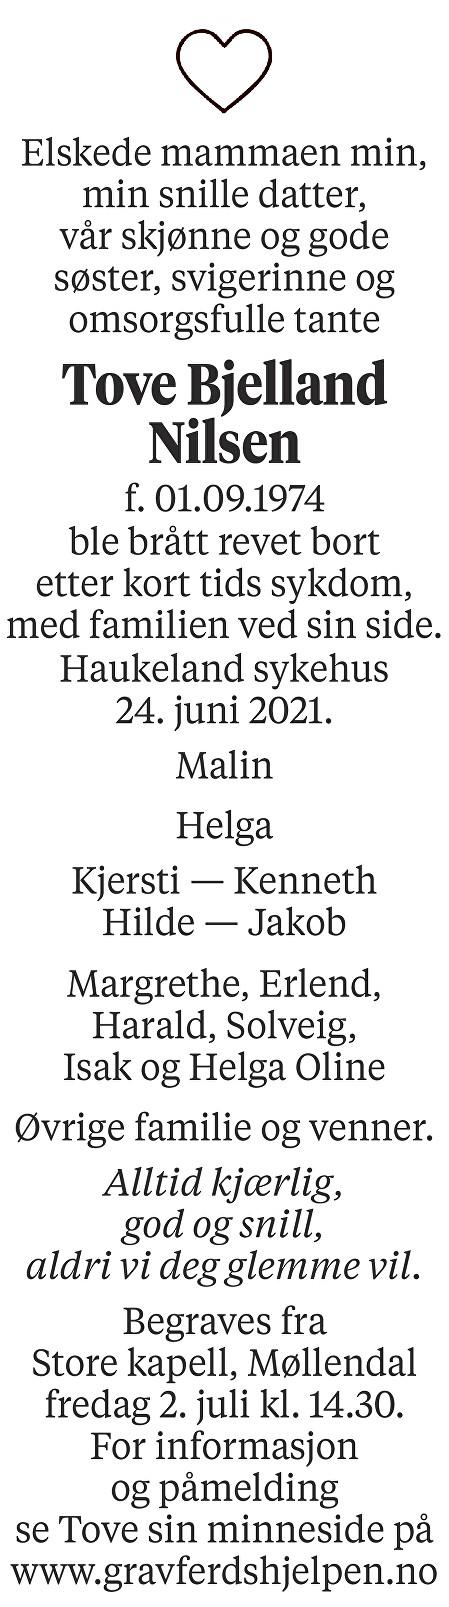 Tove Bjelland Nilsen Dødsannonse